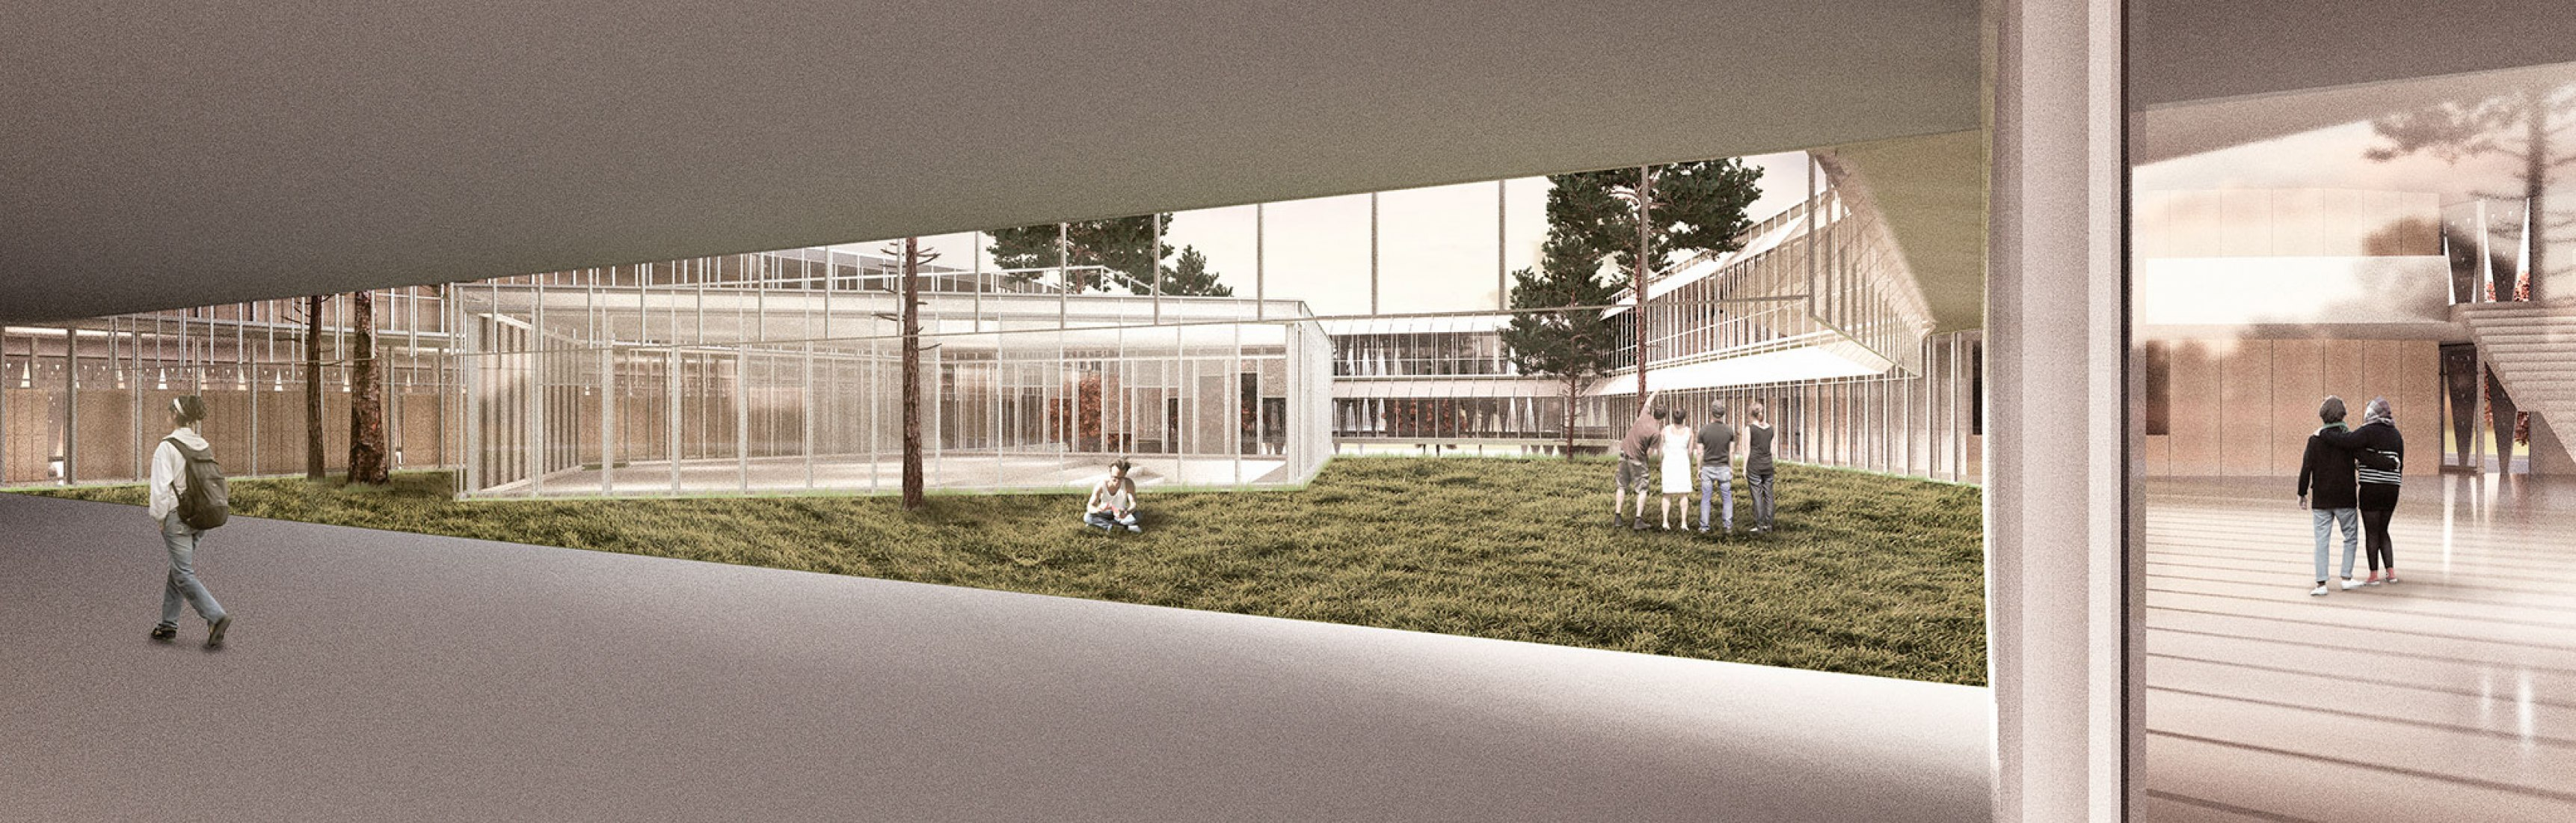 Rendering of the Campus scolastic. Porta Sud by Francisco Mangado.